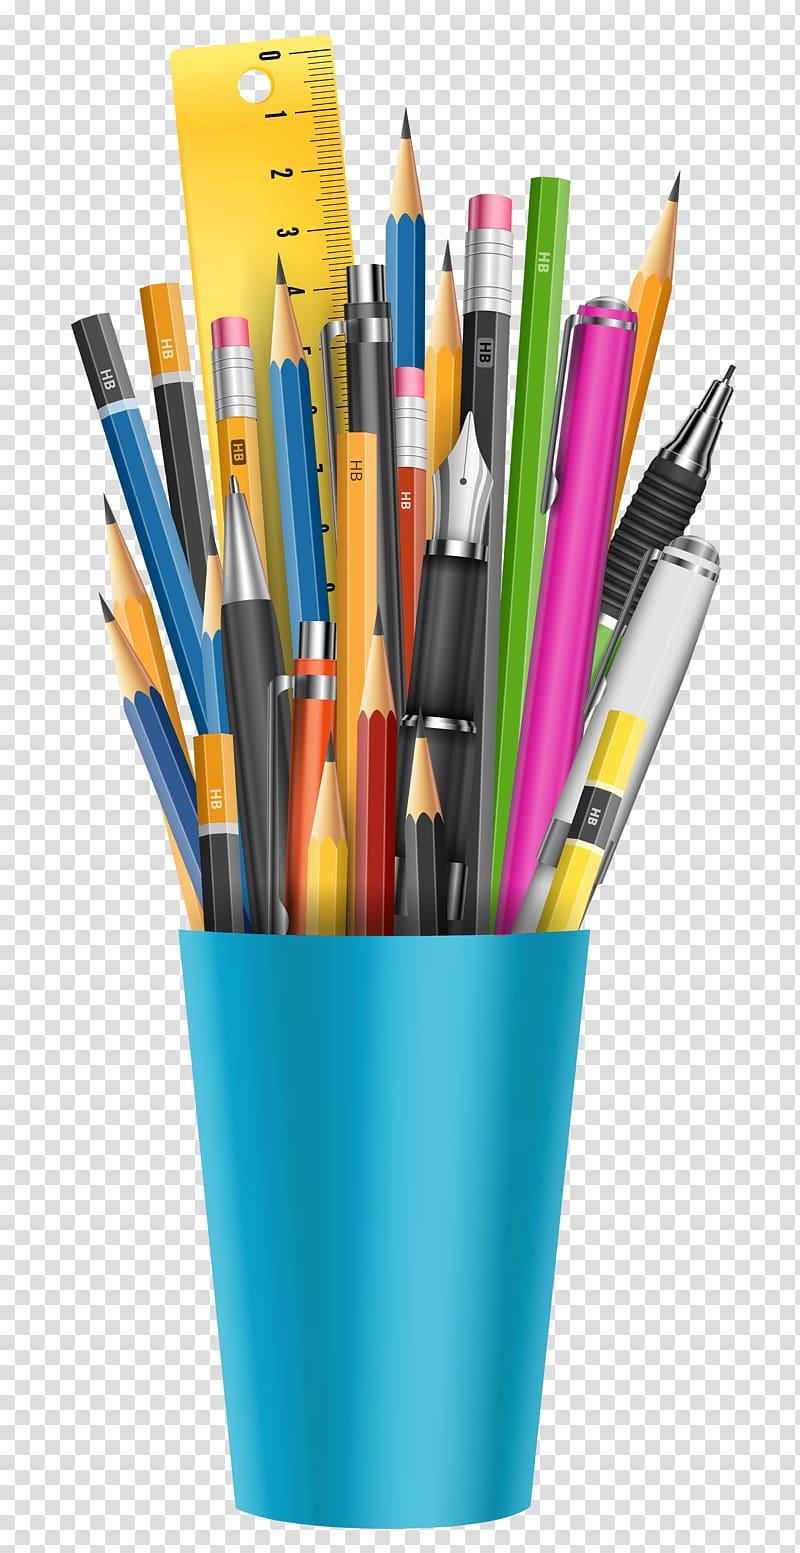 Pen & Pencil Cases Glass Marker pen, pencil transparent.